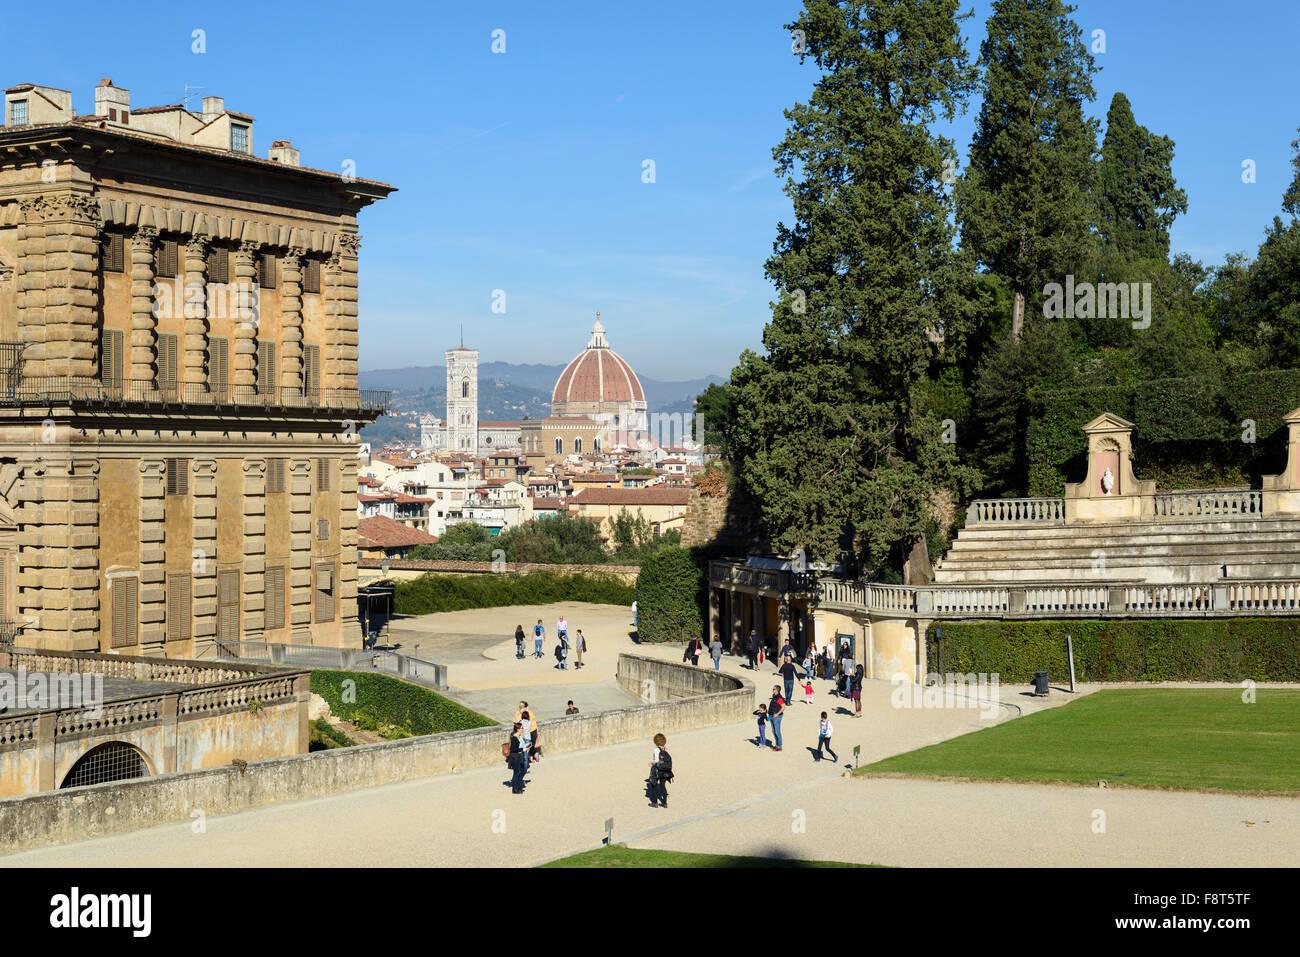 Florence. Italy. Pitti Palace & Boboli Gardens. - Stock Image